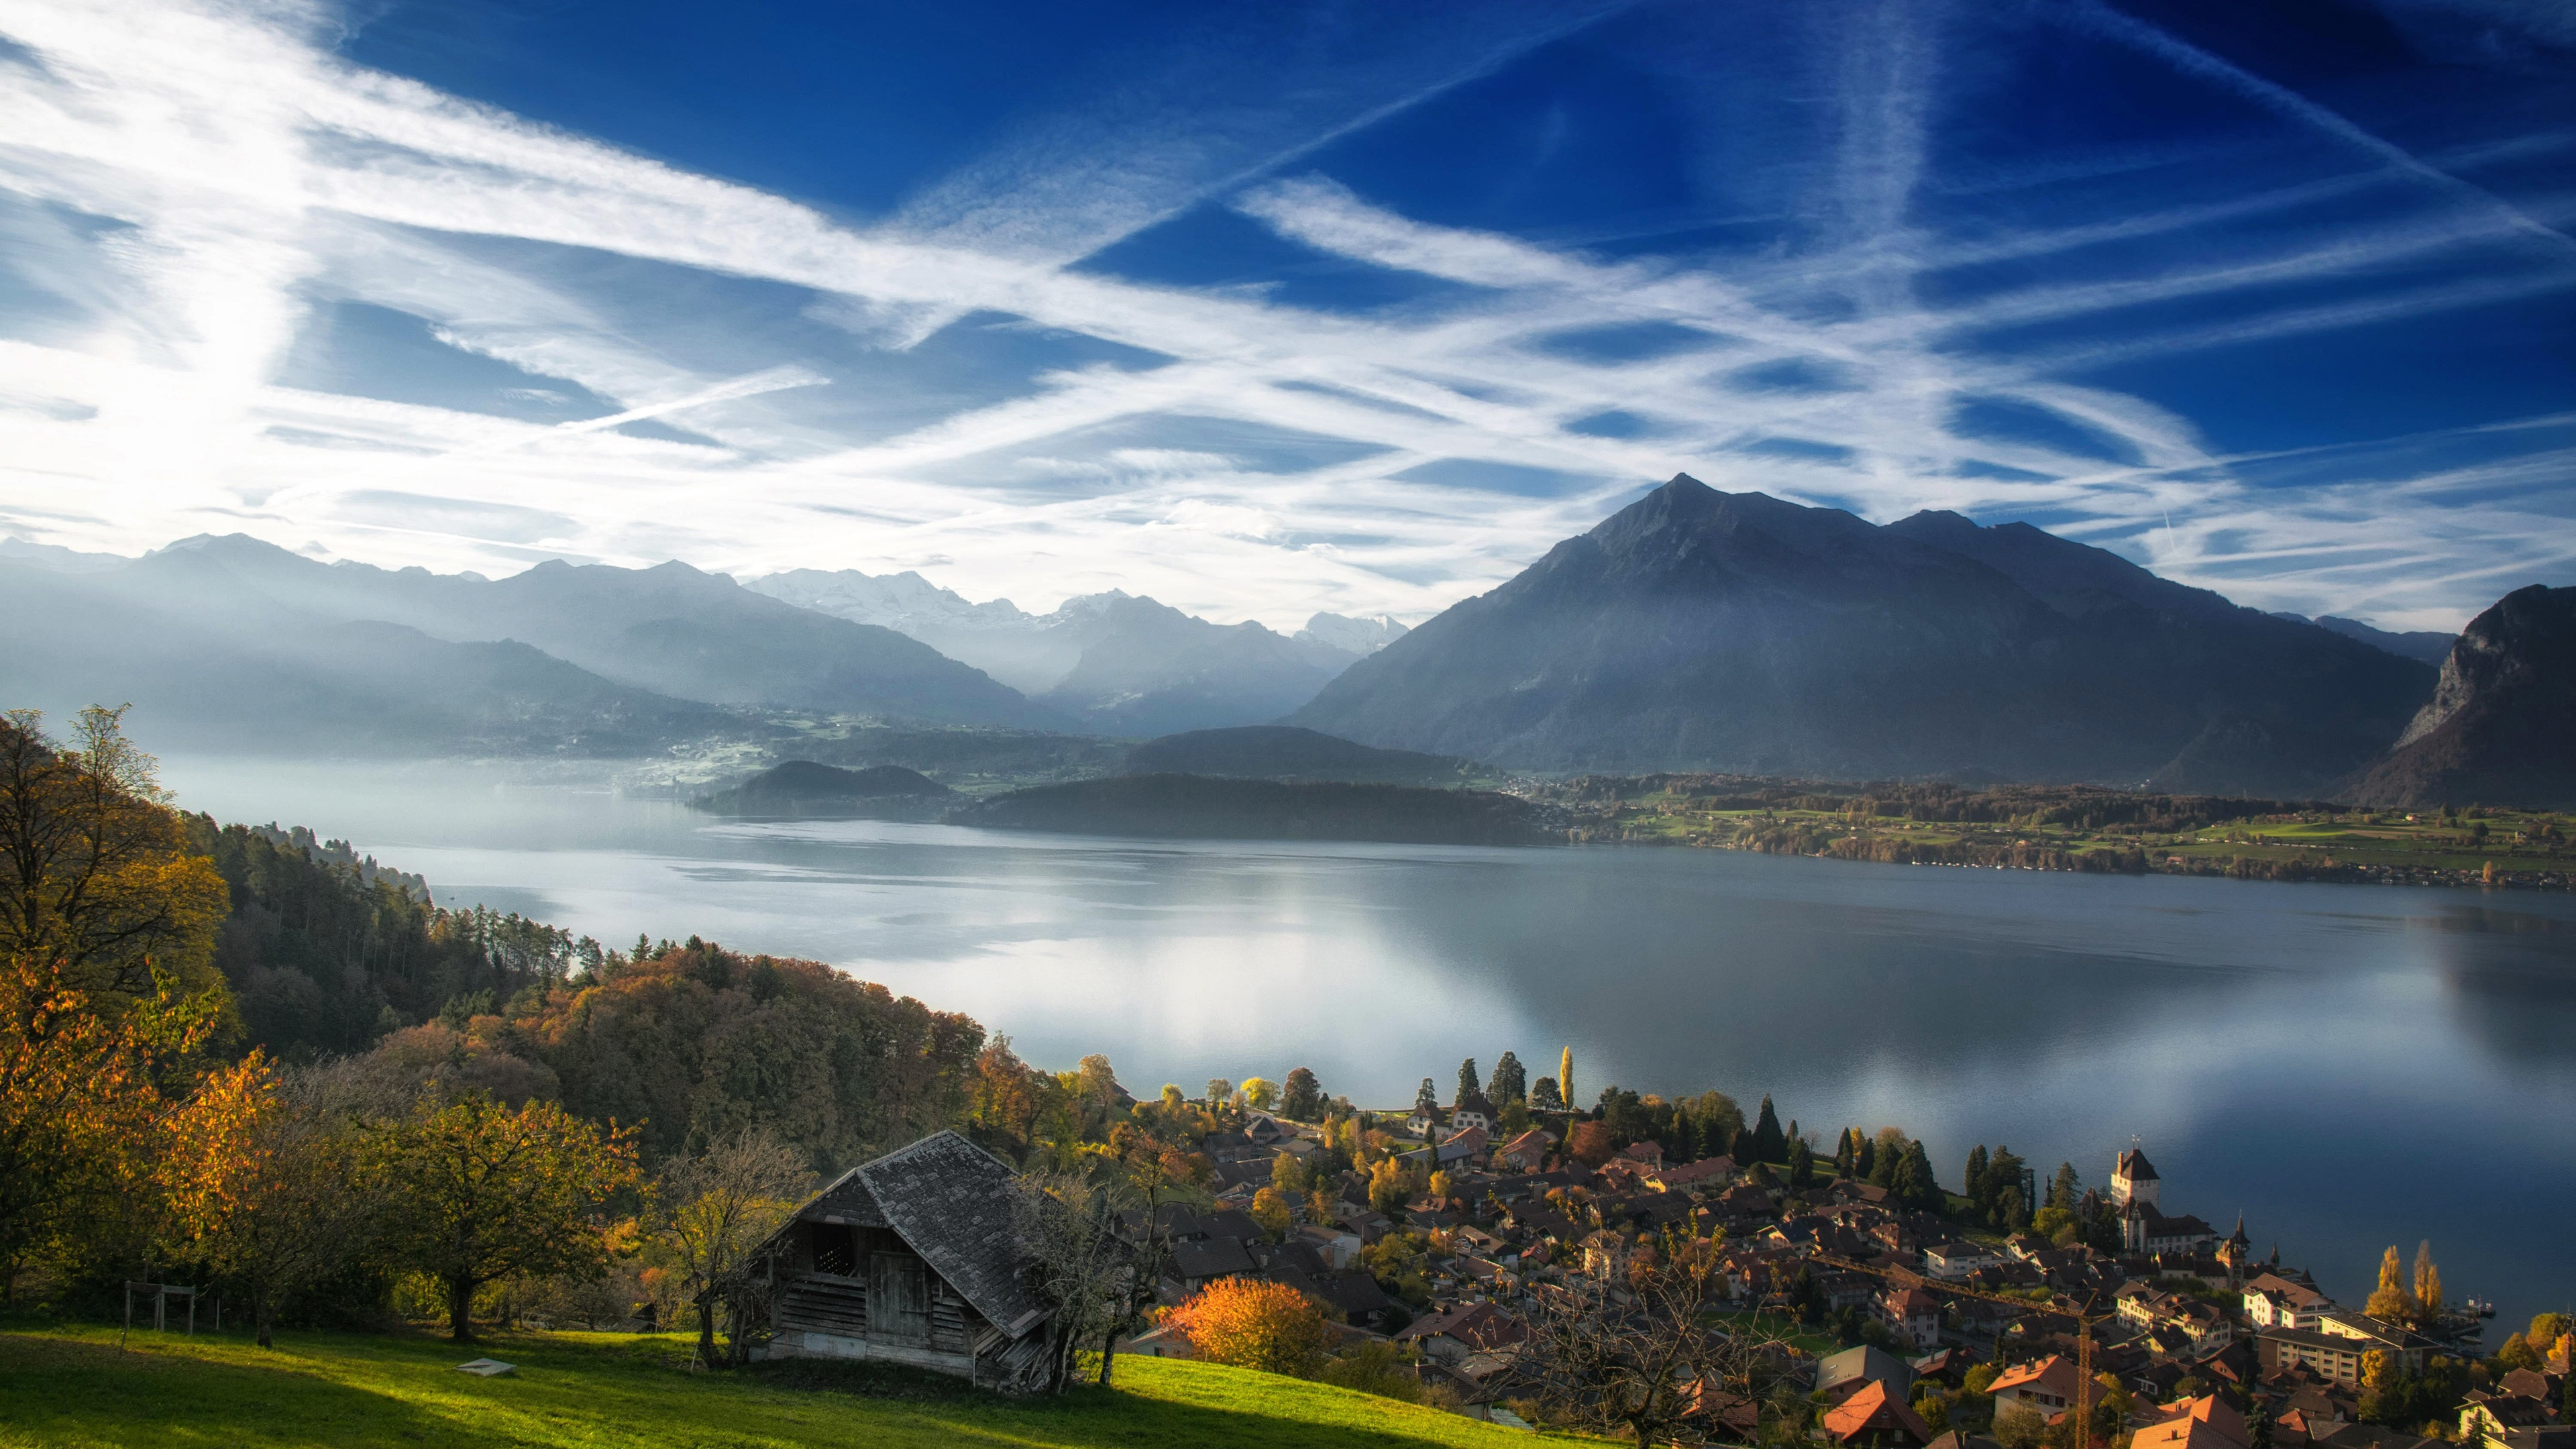 Wallpaper Switzerland Interlaken Lake Thun city mountains 3840x2160